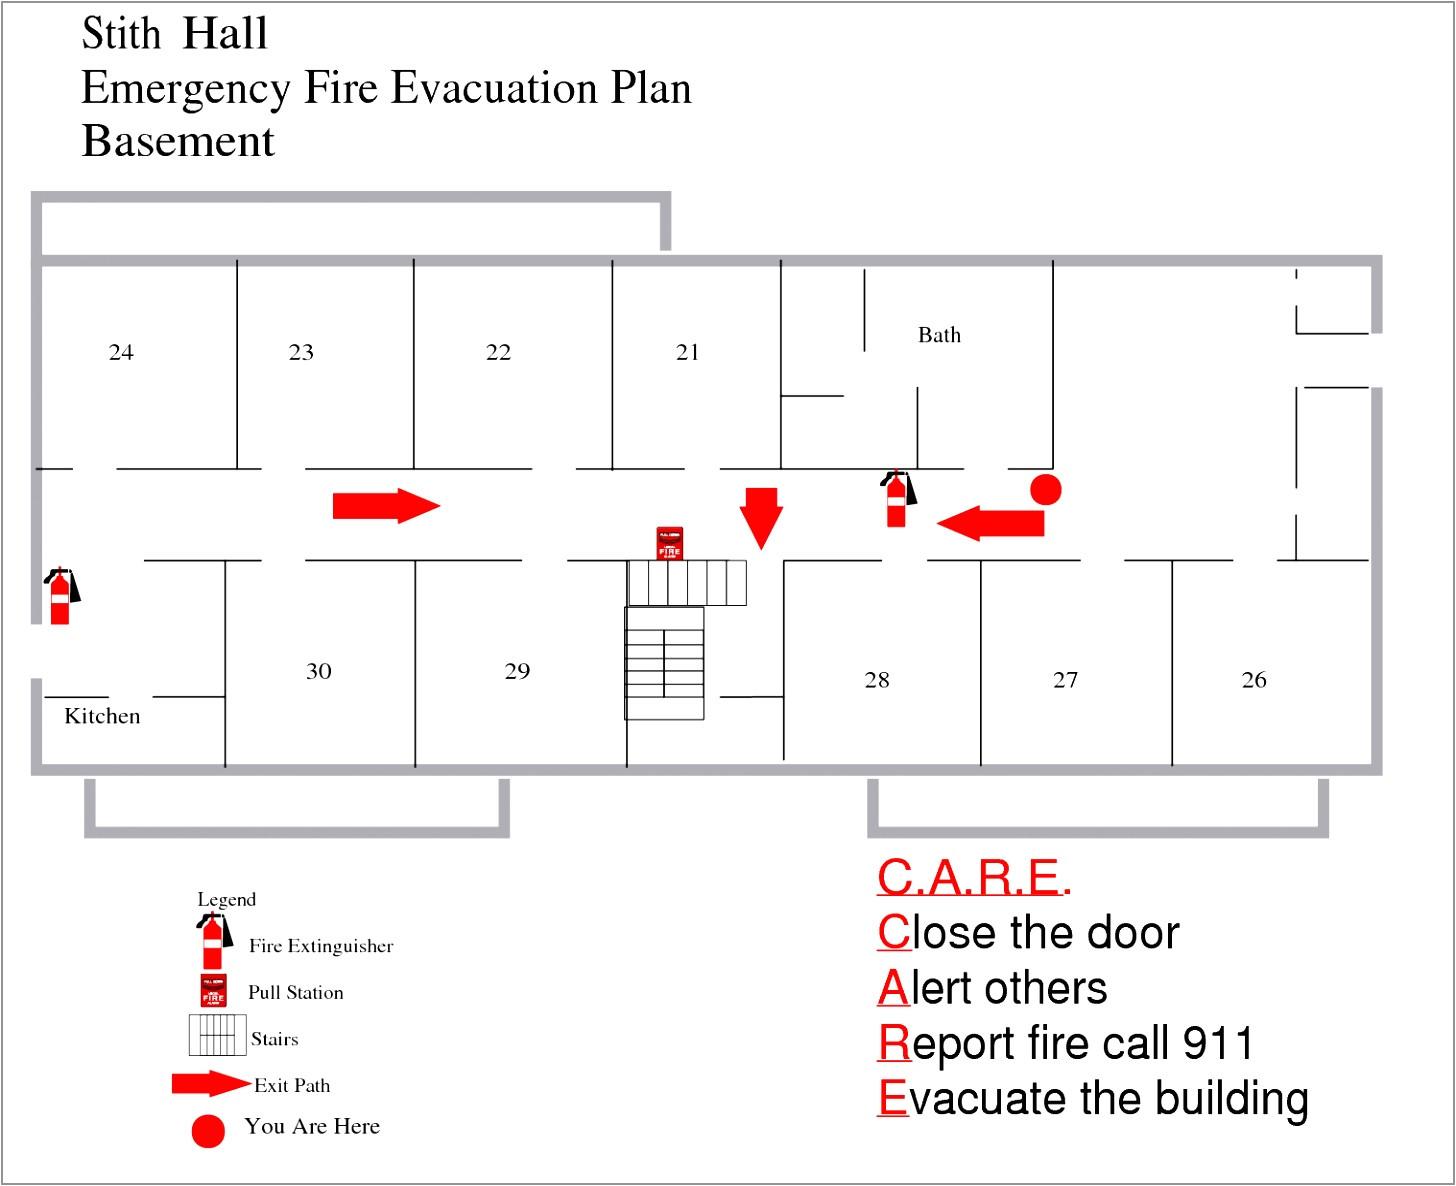 Home Evacuation Plan 12 Home Fire Evacuation Plan Template Ierde Templatesz234